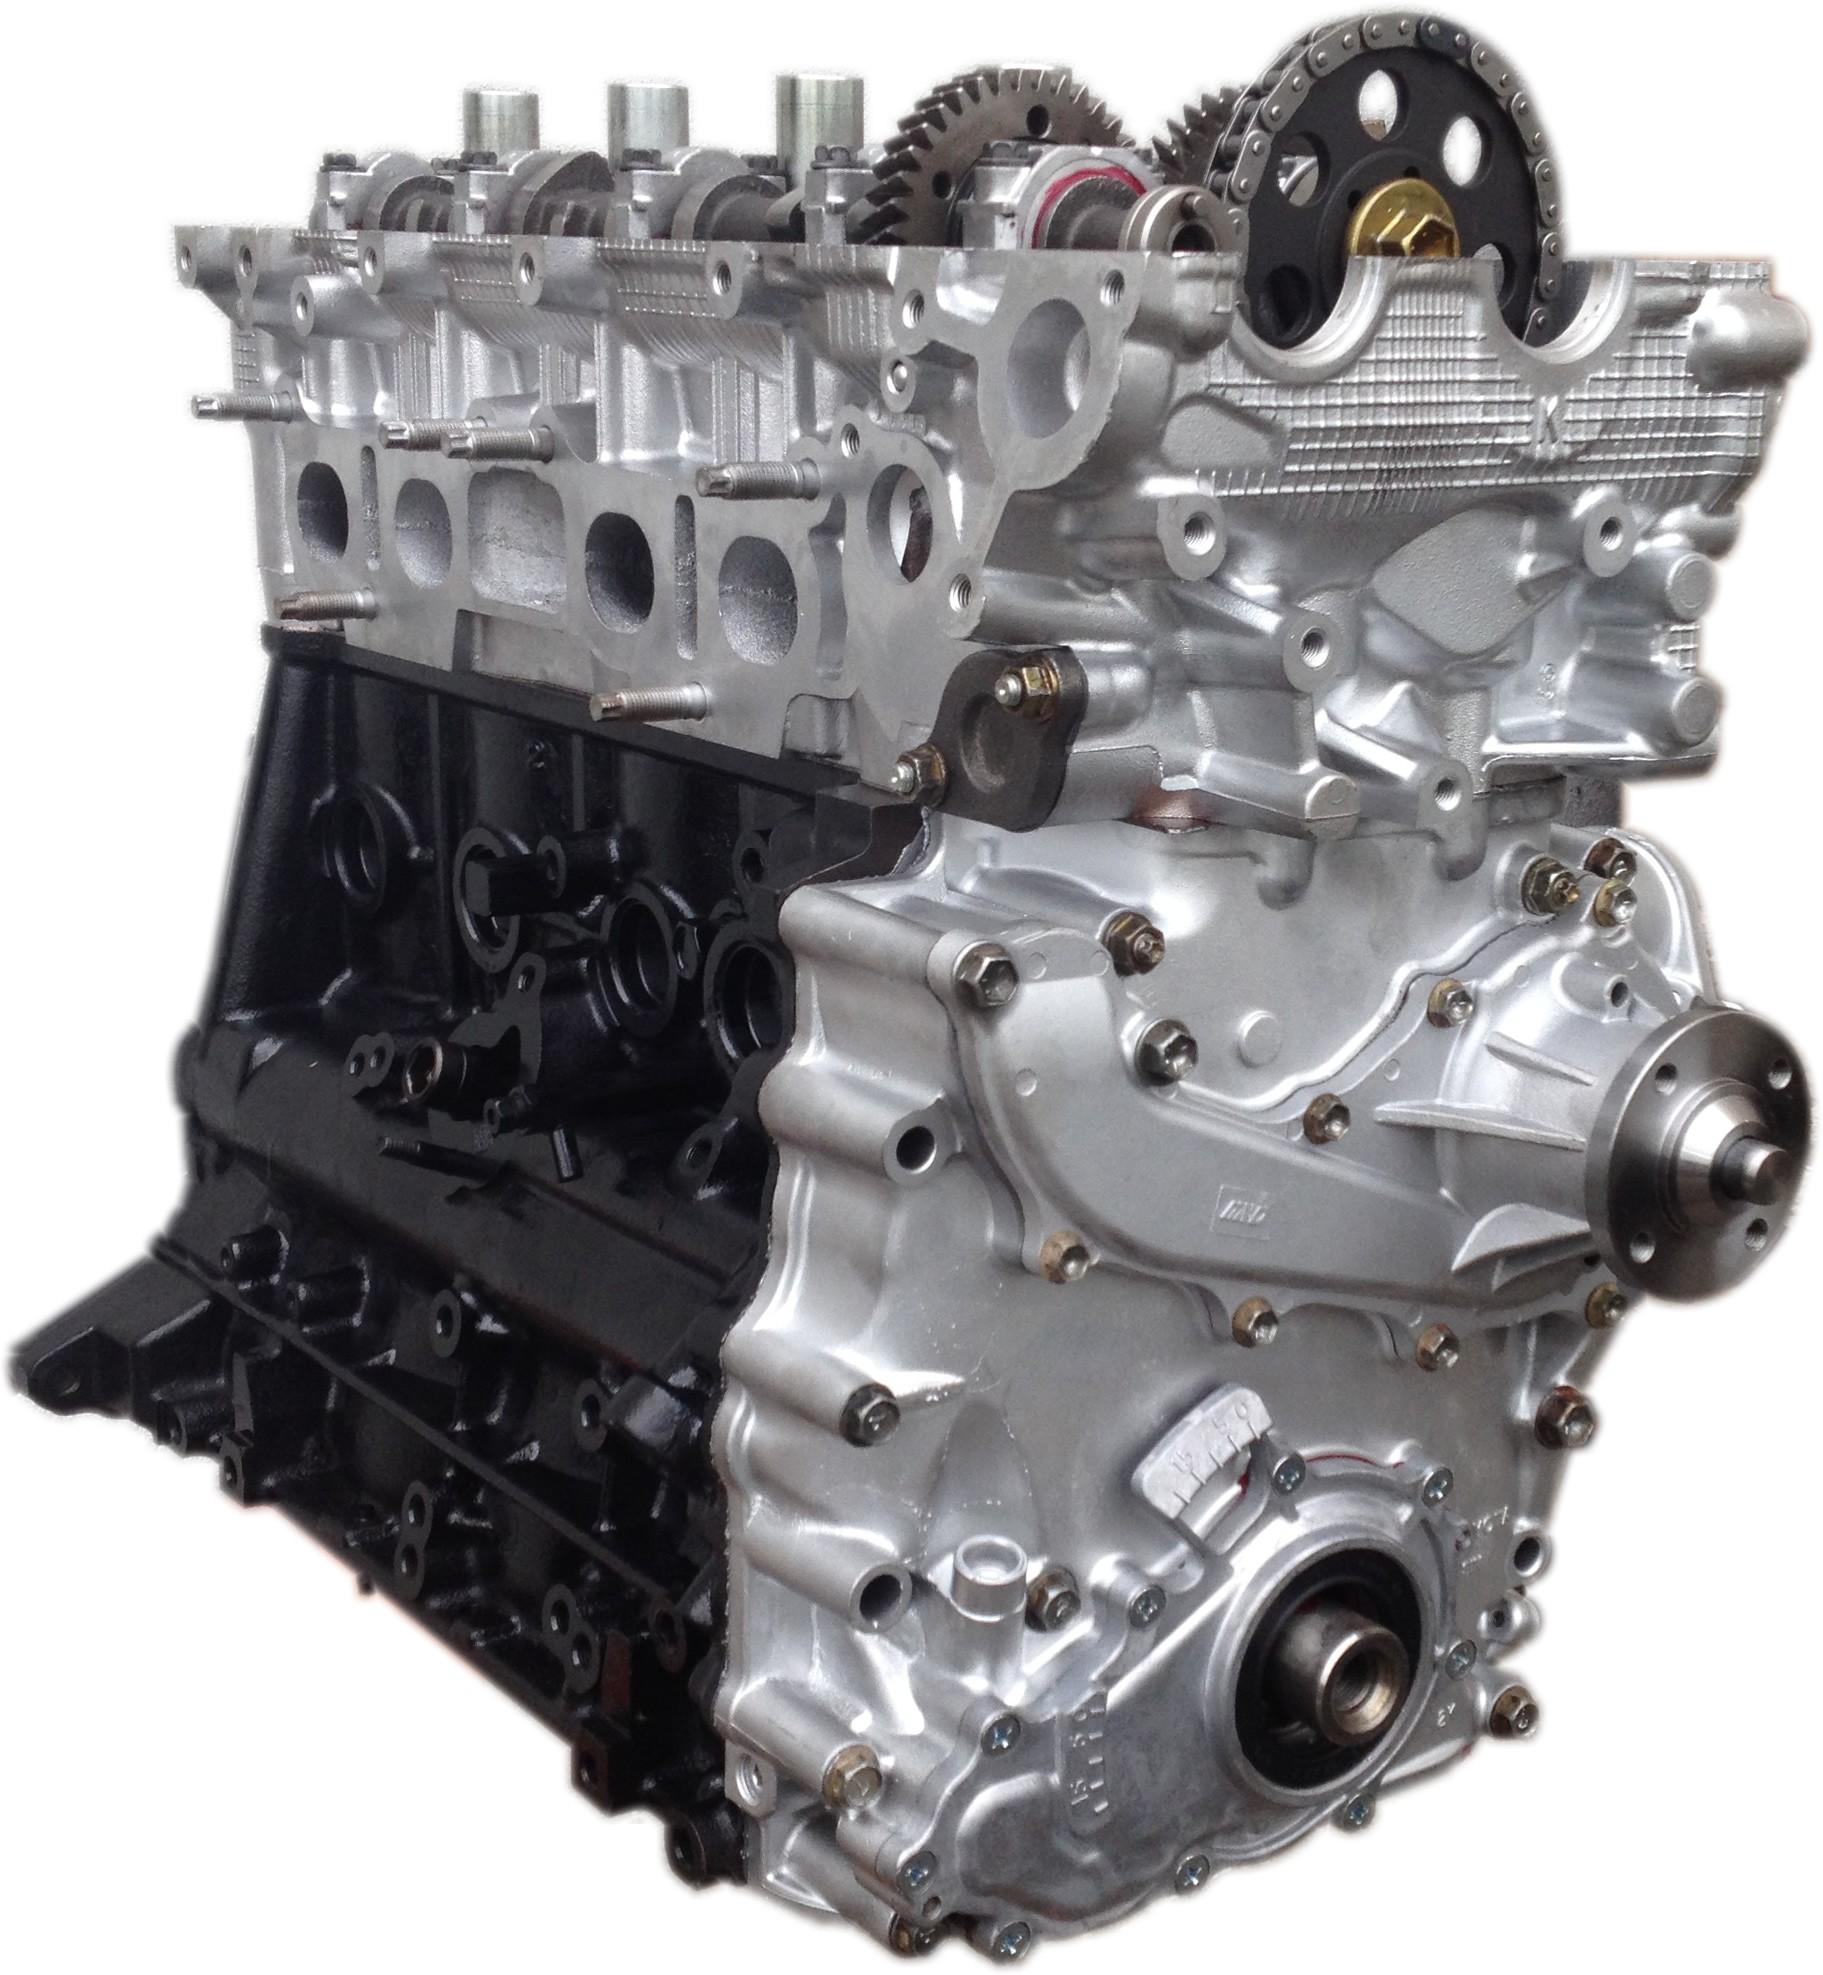 Rebuilt 97 00 Toyota Tacoma 4wd 4cyl 2 7l 3rz Engine Kar